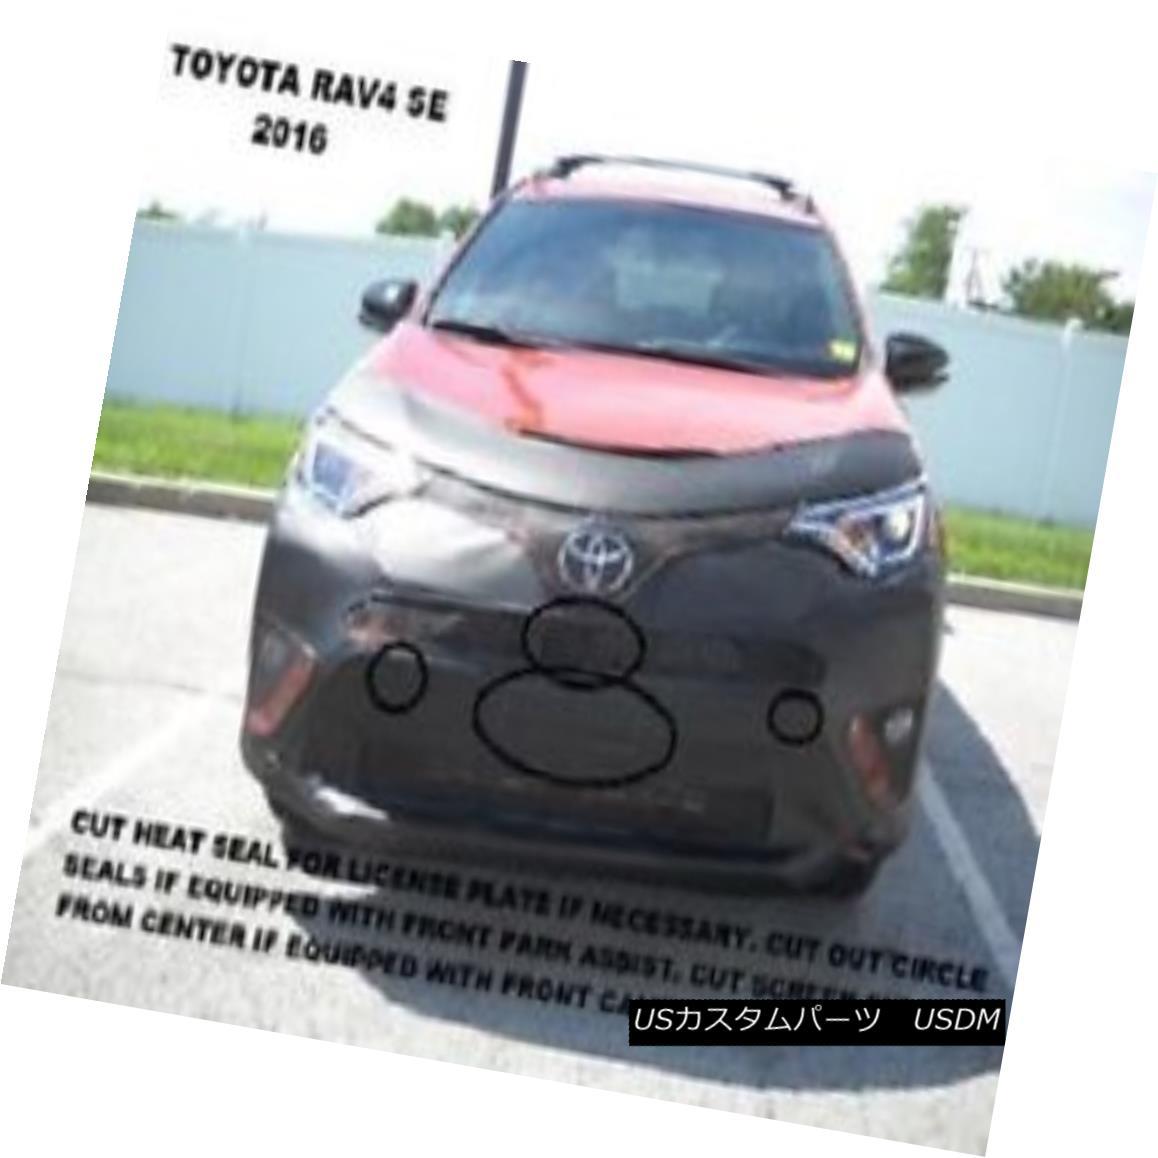 End Toyota RAV4 Lebraフロントエンド・カバー・ブラ・マスク・フィット2016 SE Front ノーズブラ Toyota フルブラ Cover Fits Lebra Mask Bra SE 2016 RAV4